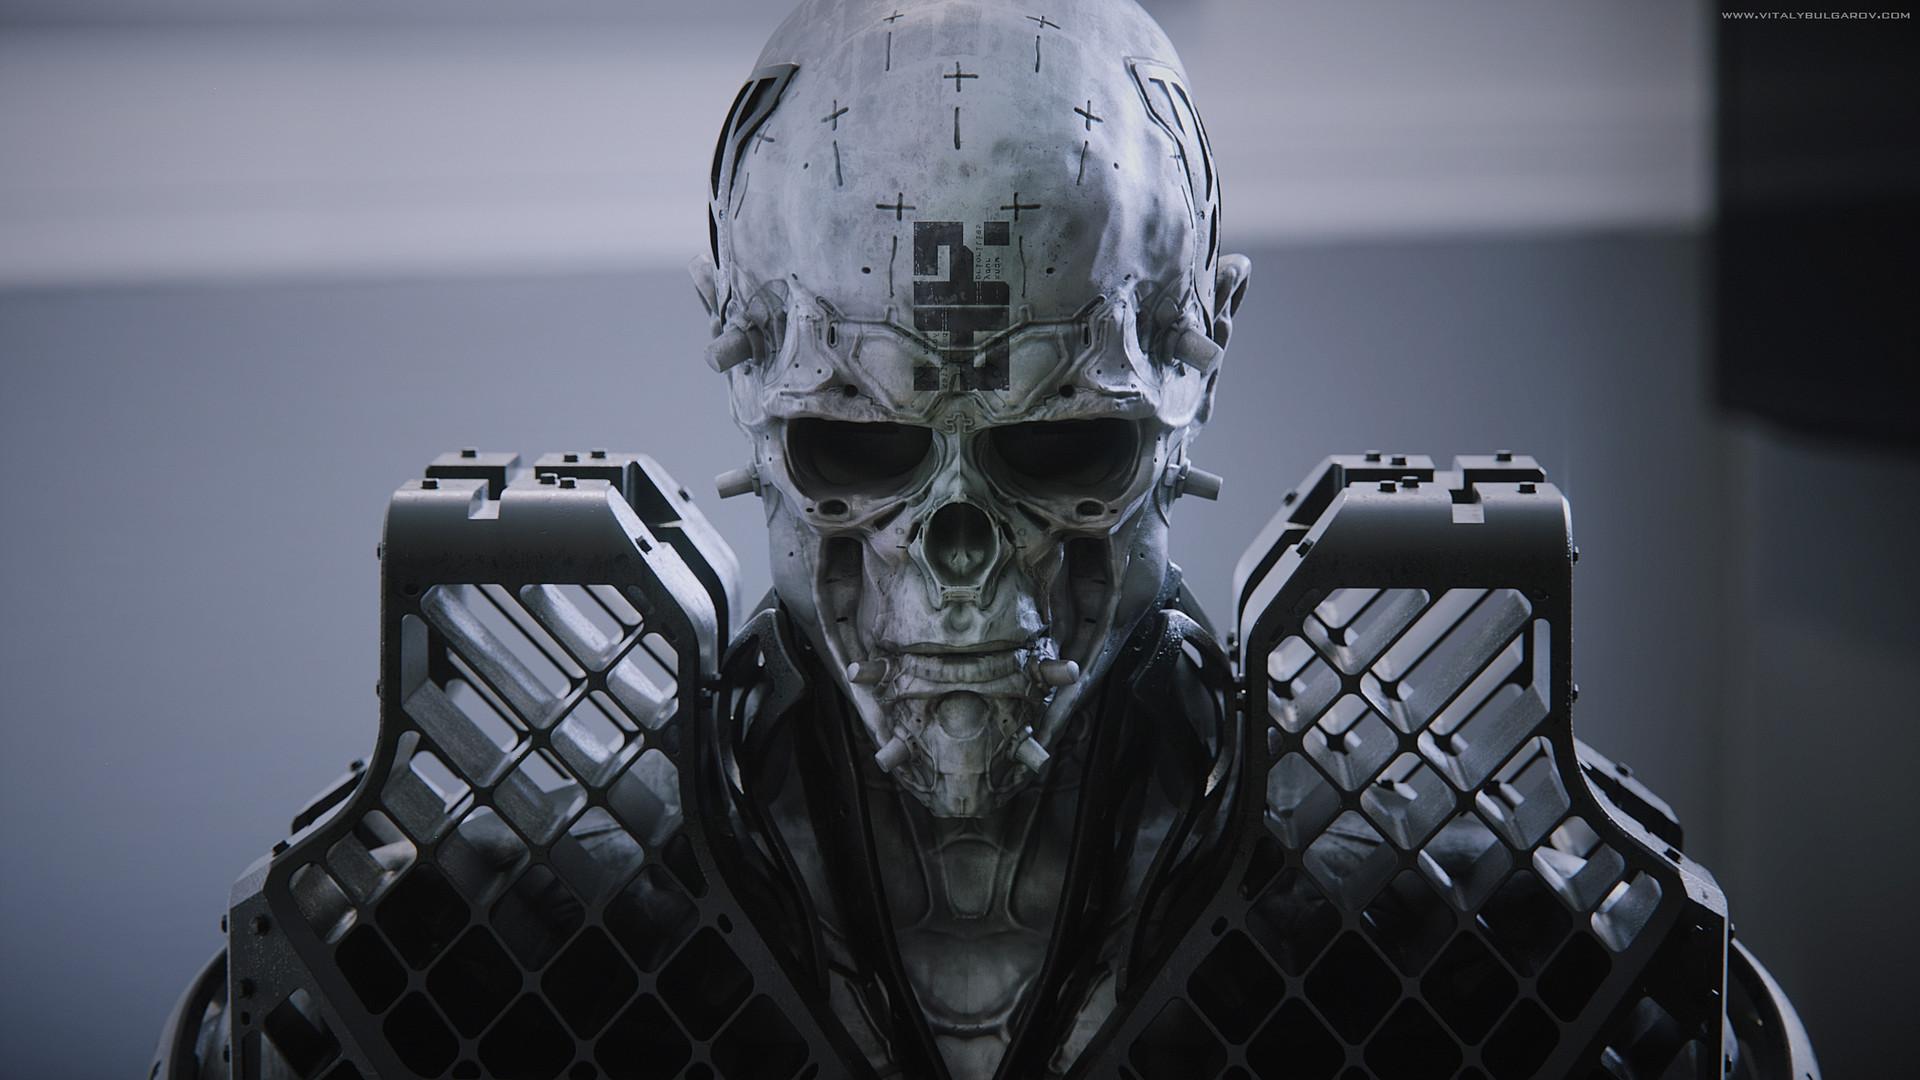 Cyberpunk Mask download wallpaper image